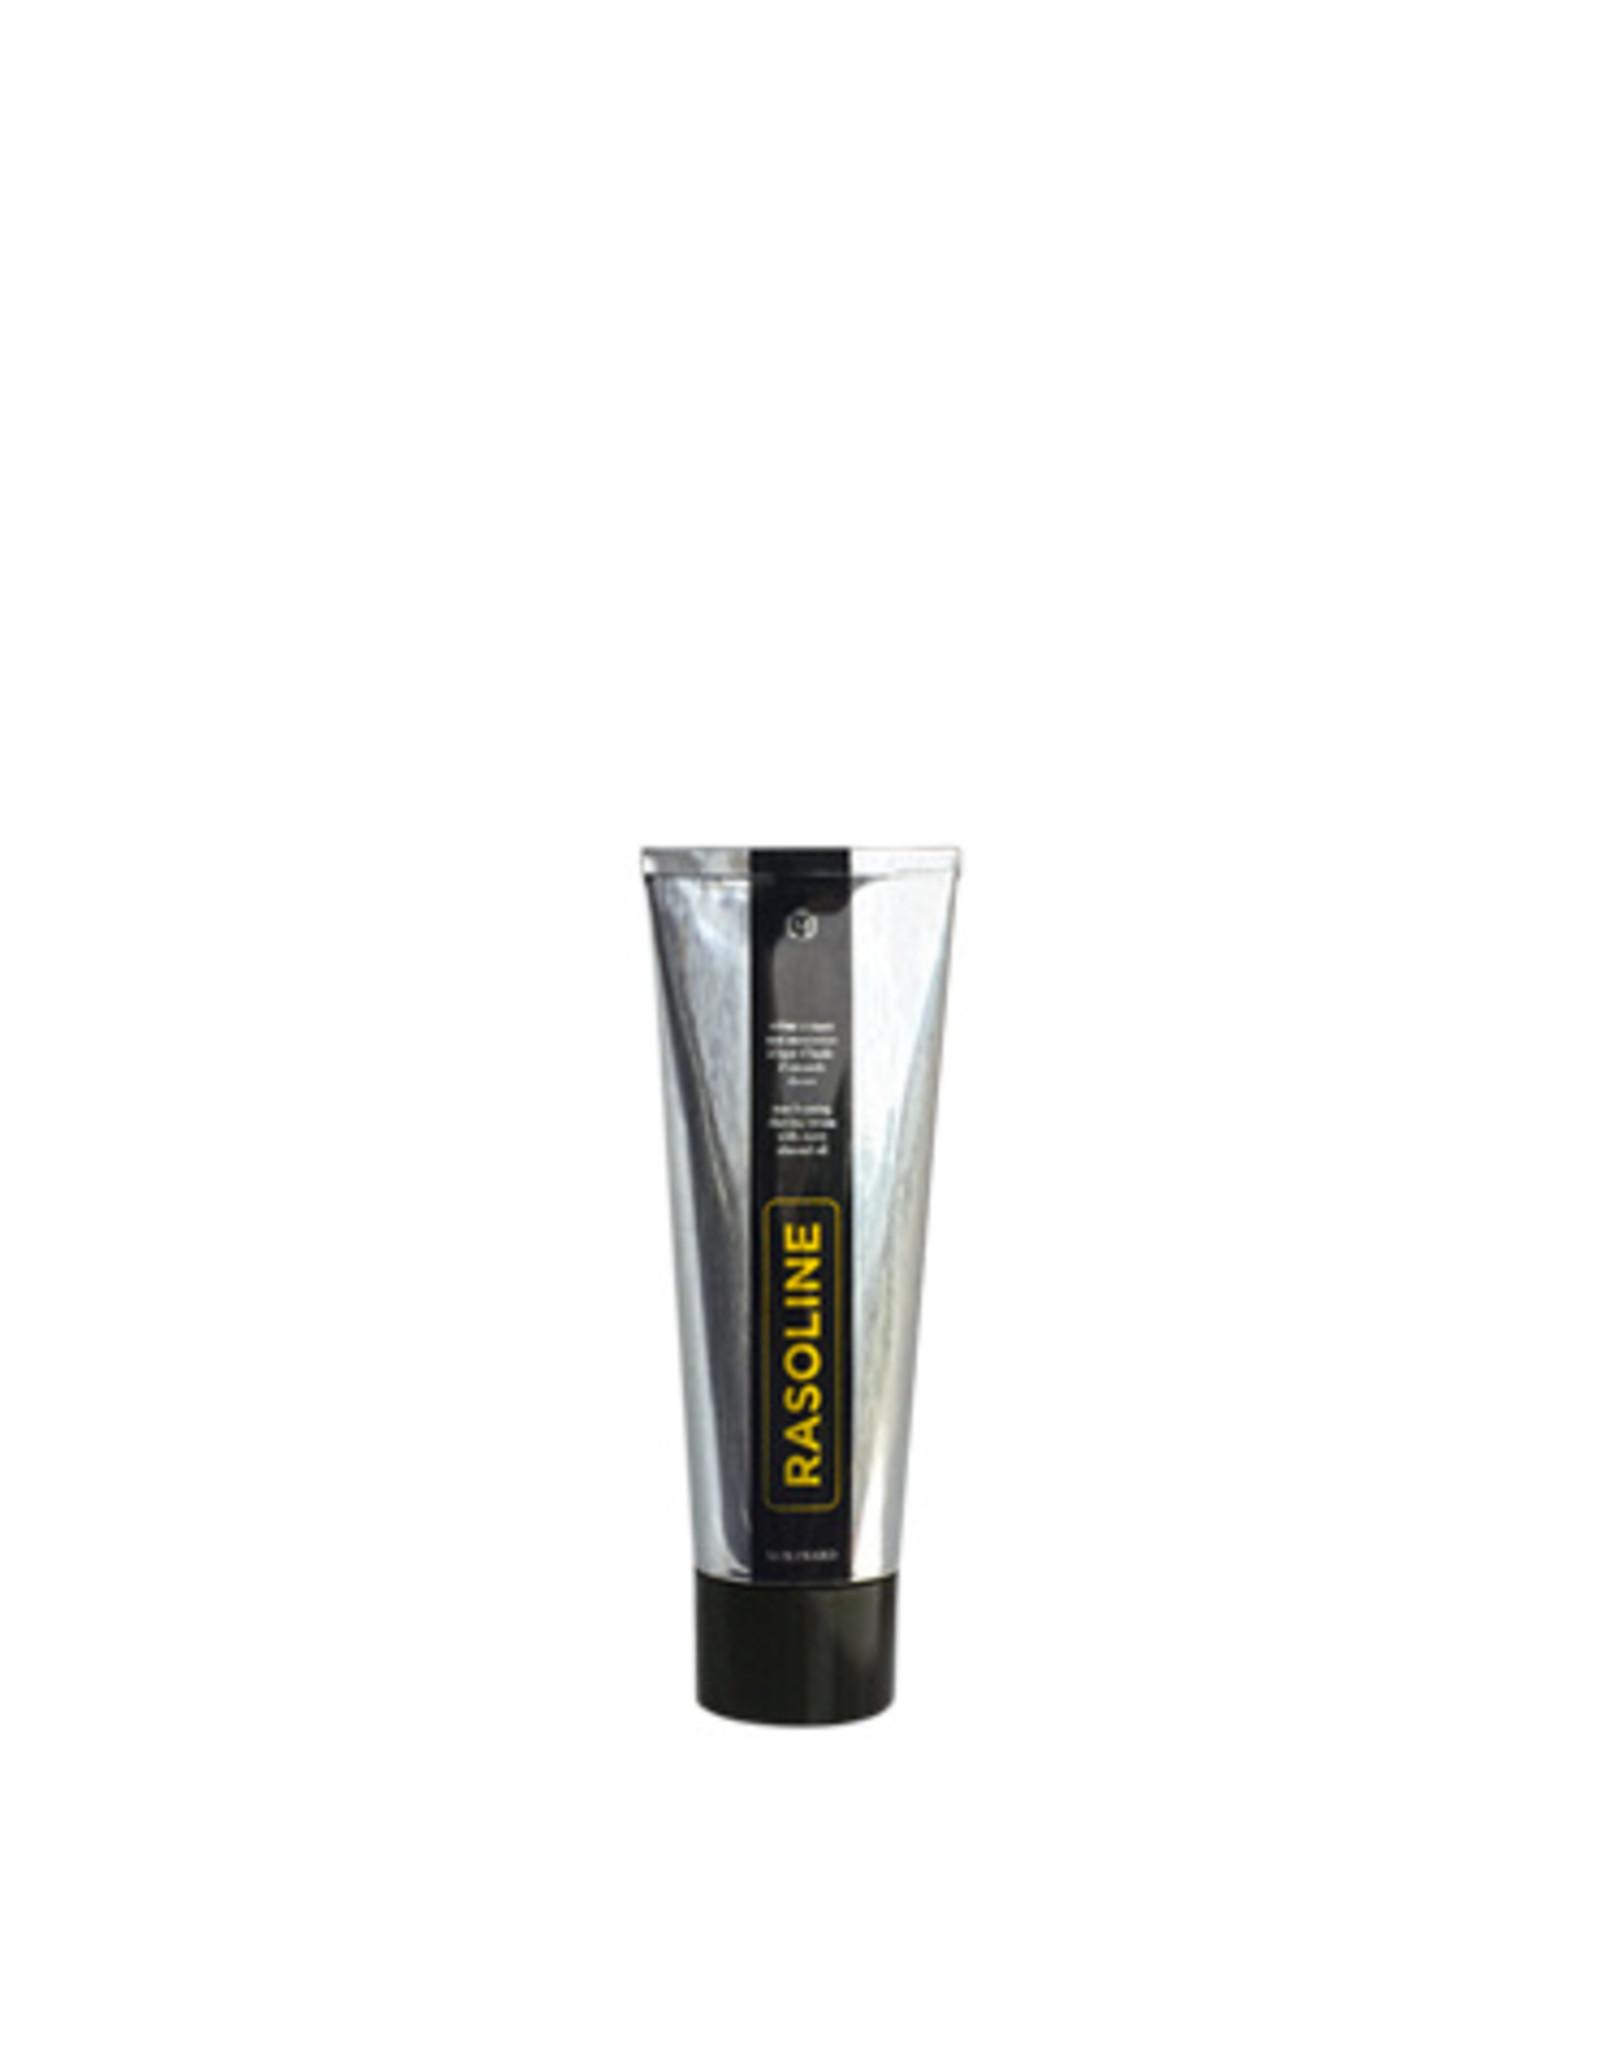 Molinard Rasoline - Molinard - Shaving Cream